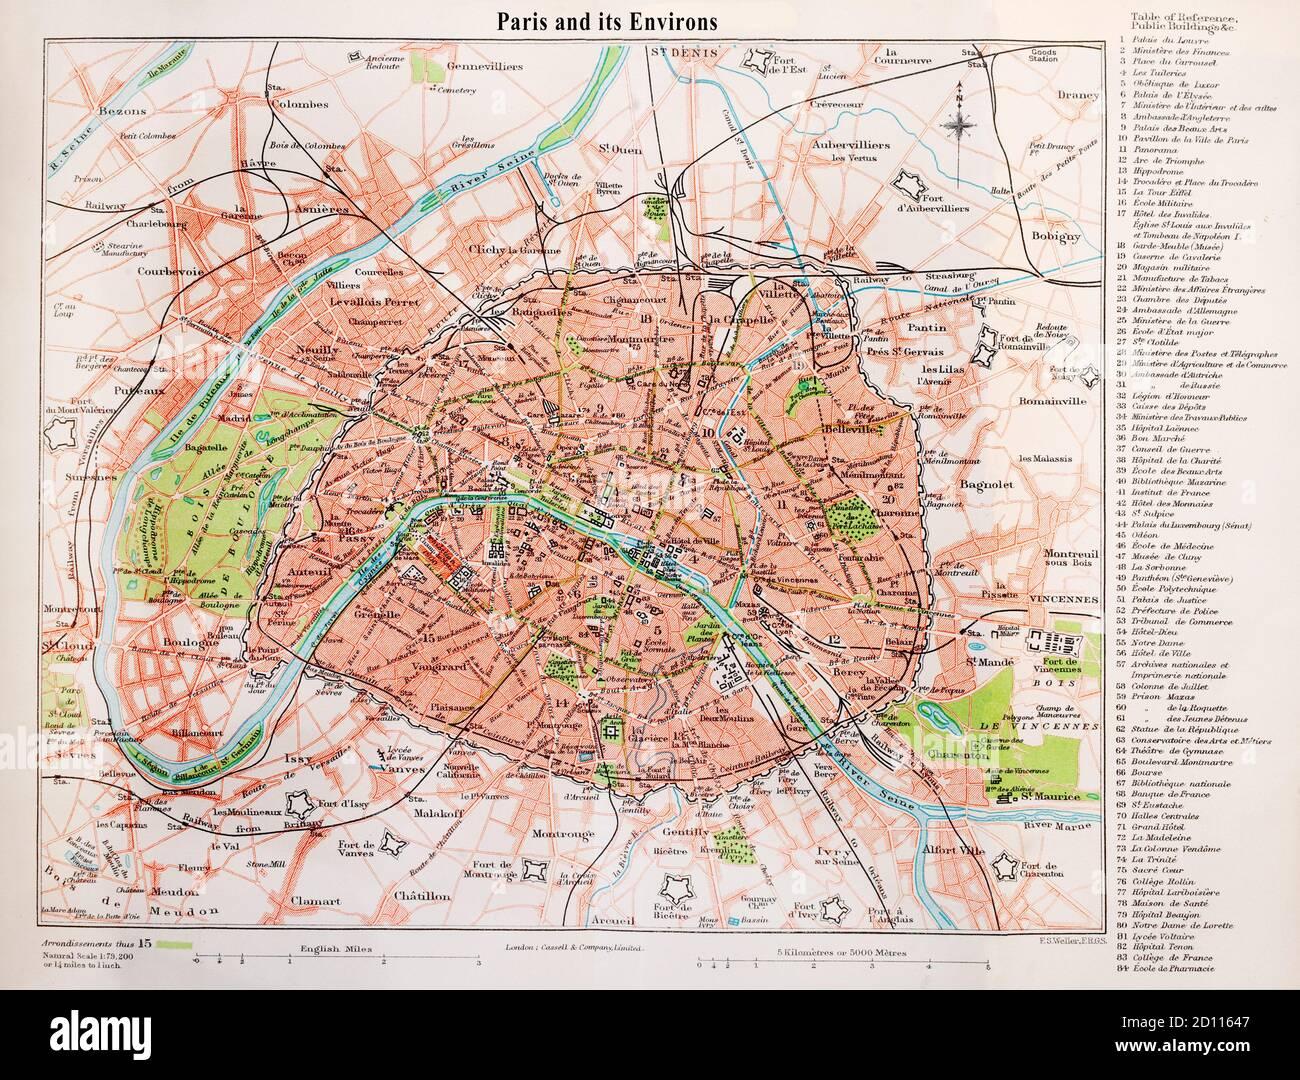 Cartina Di Parigi E Dintorni.Paris Map 19th Century Immagini E Fotos Stock Alamy